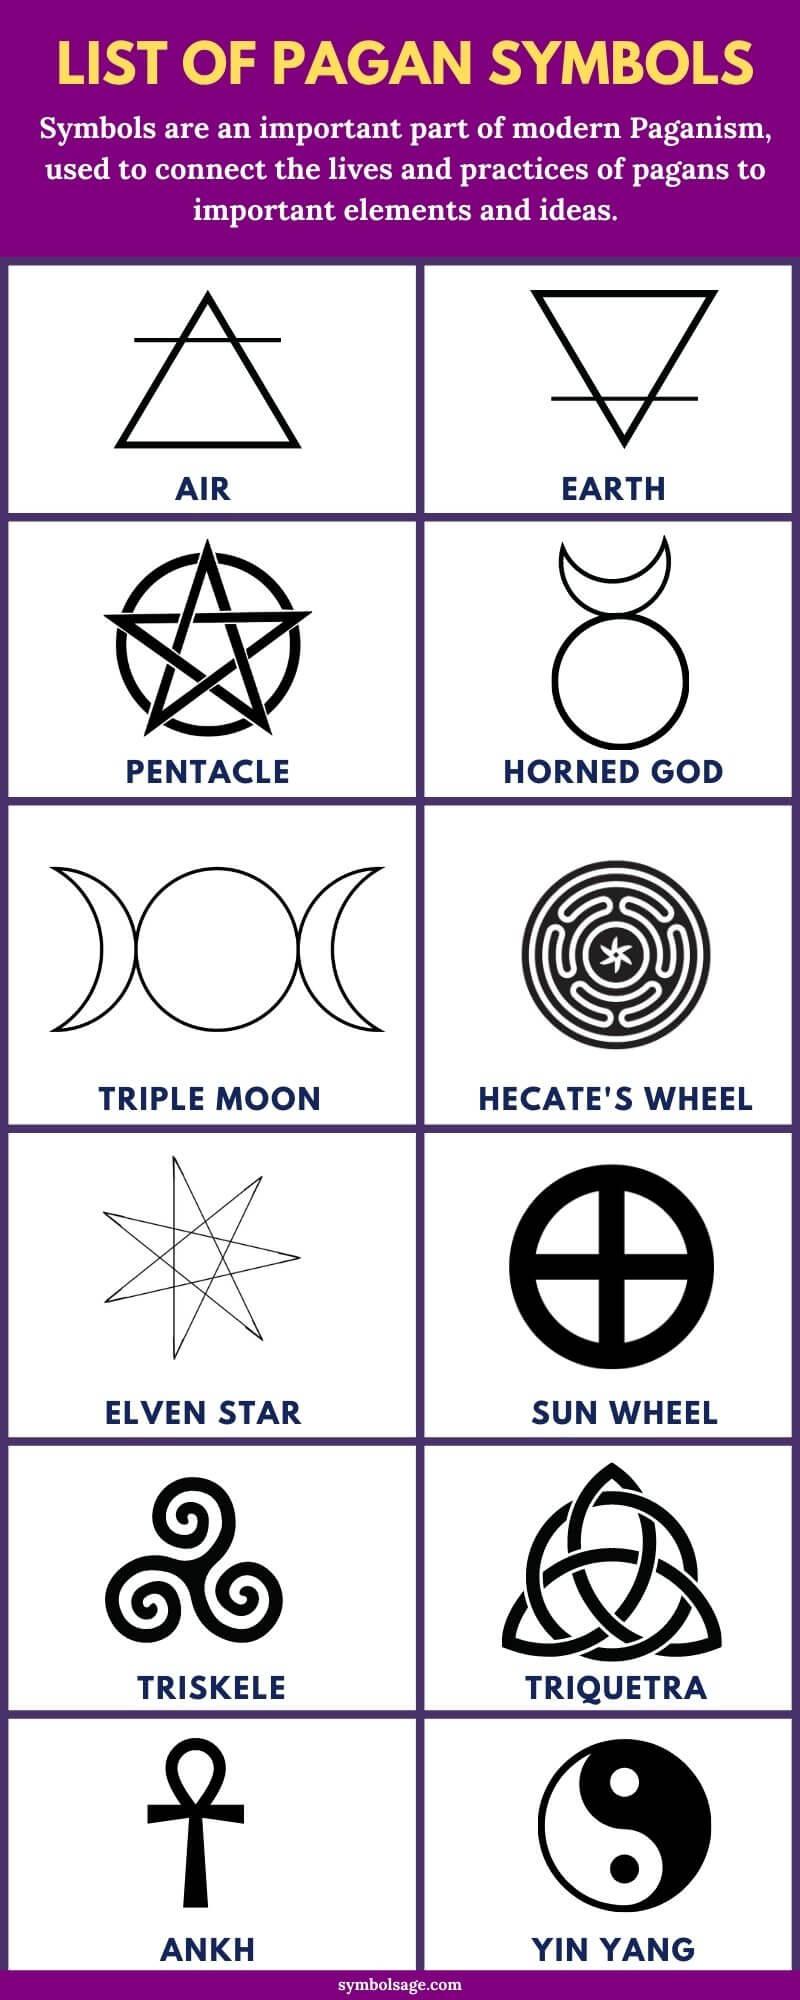 List of pagan symbols